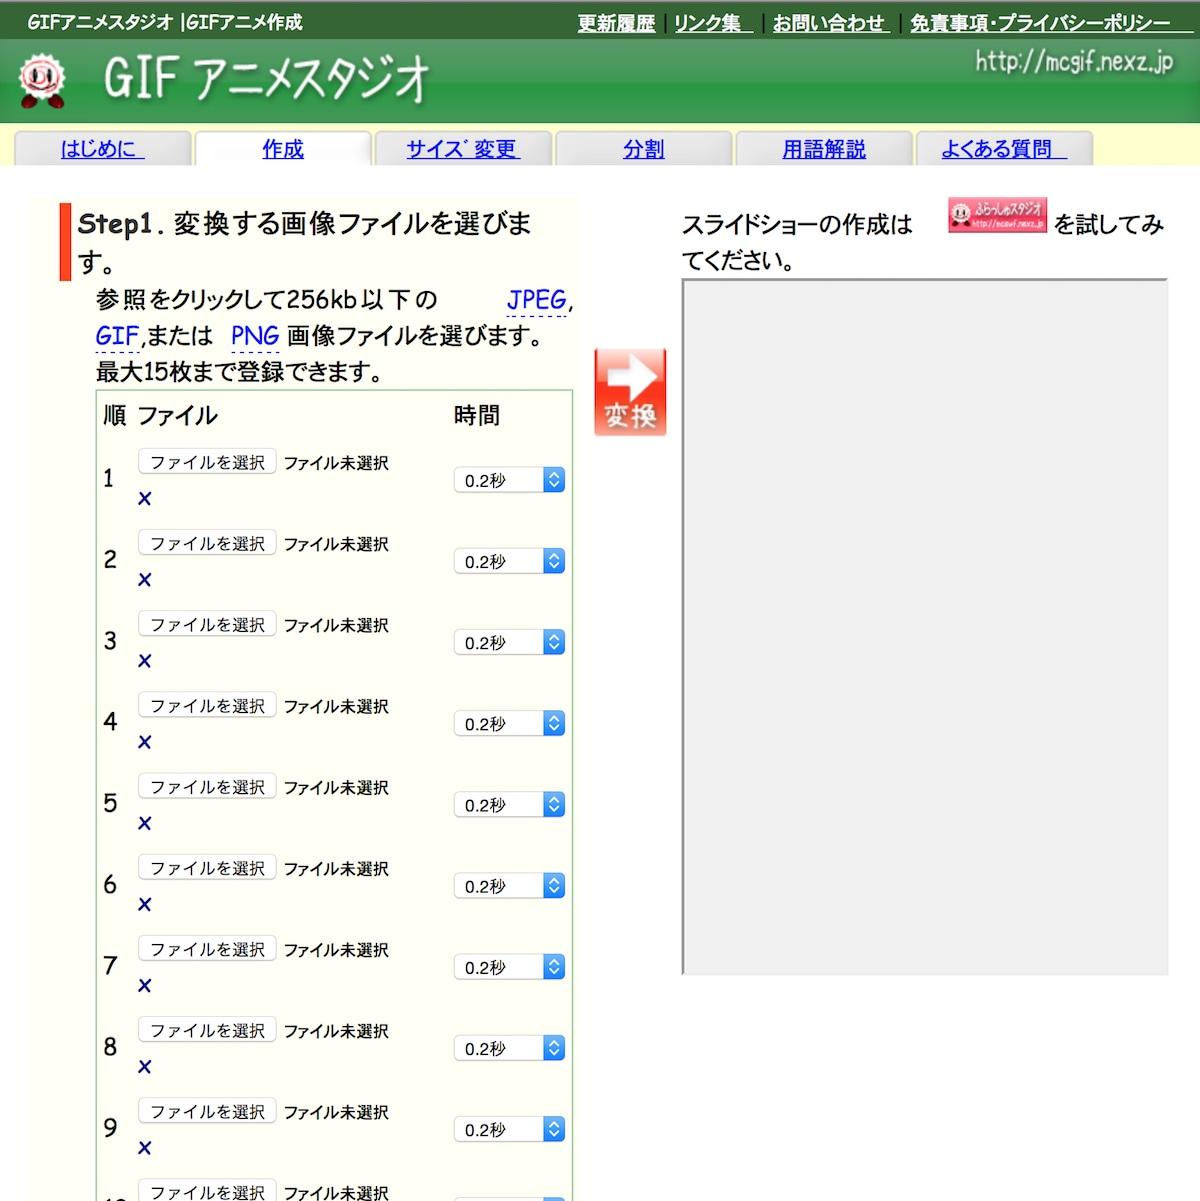 gif-animation-web-service-gif-anime-studio